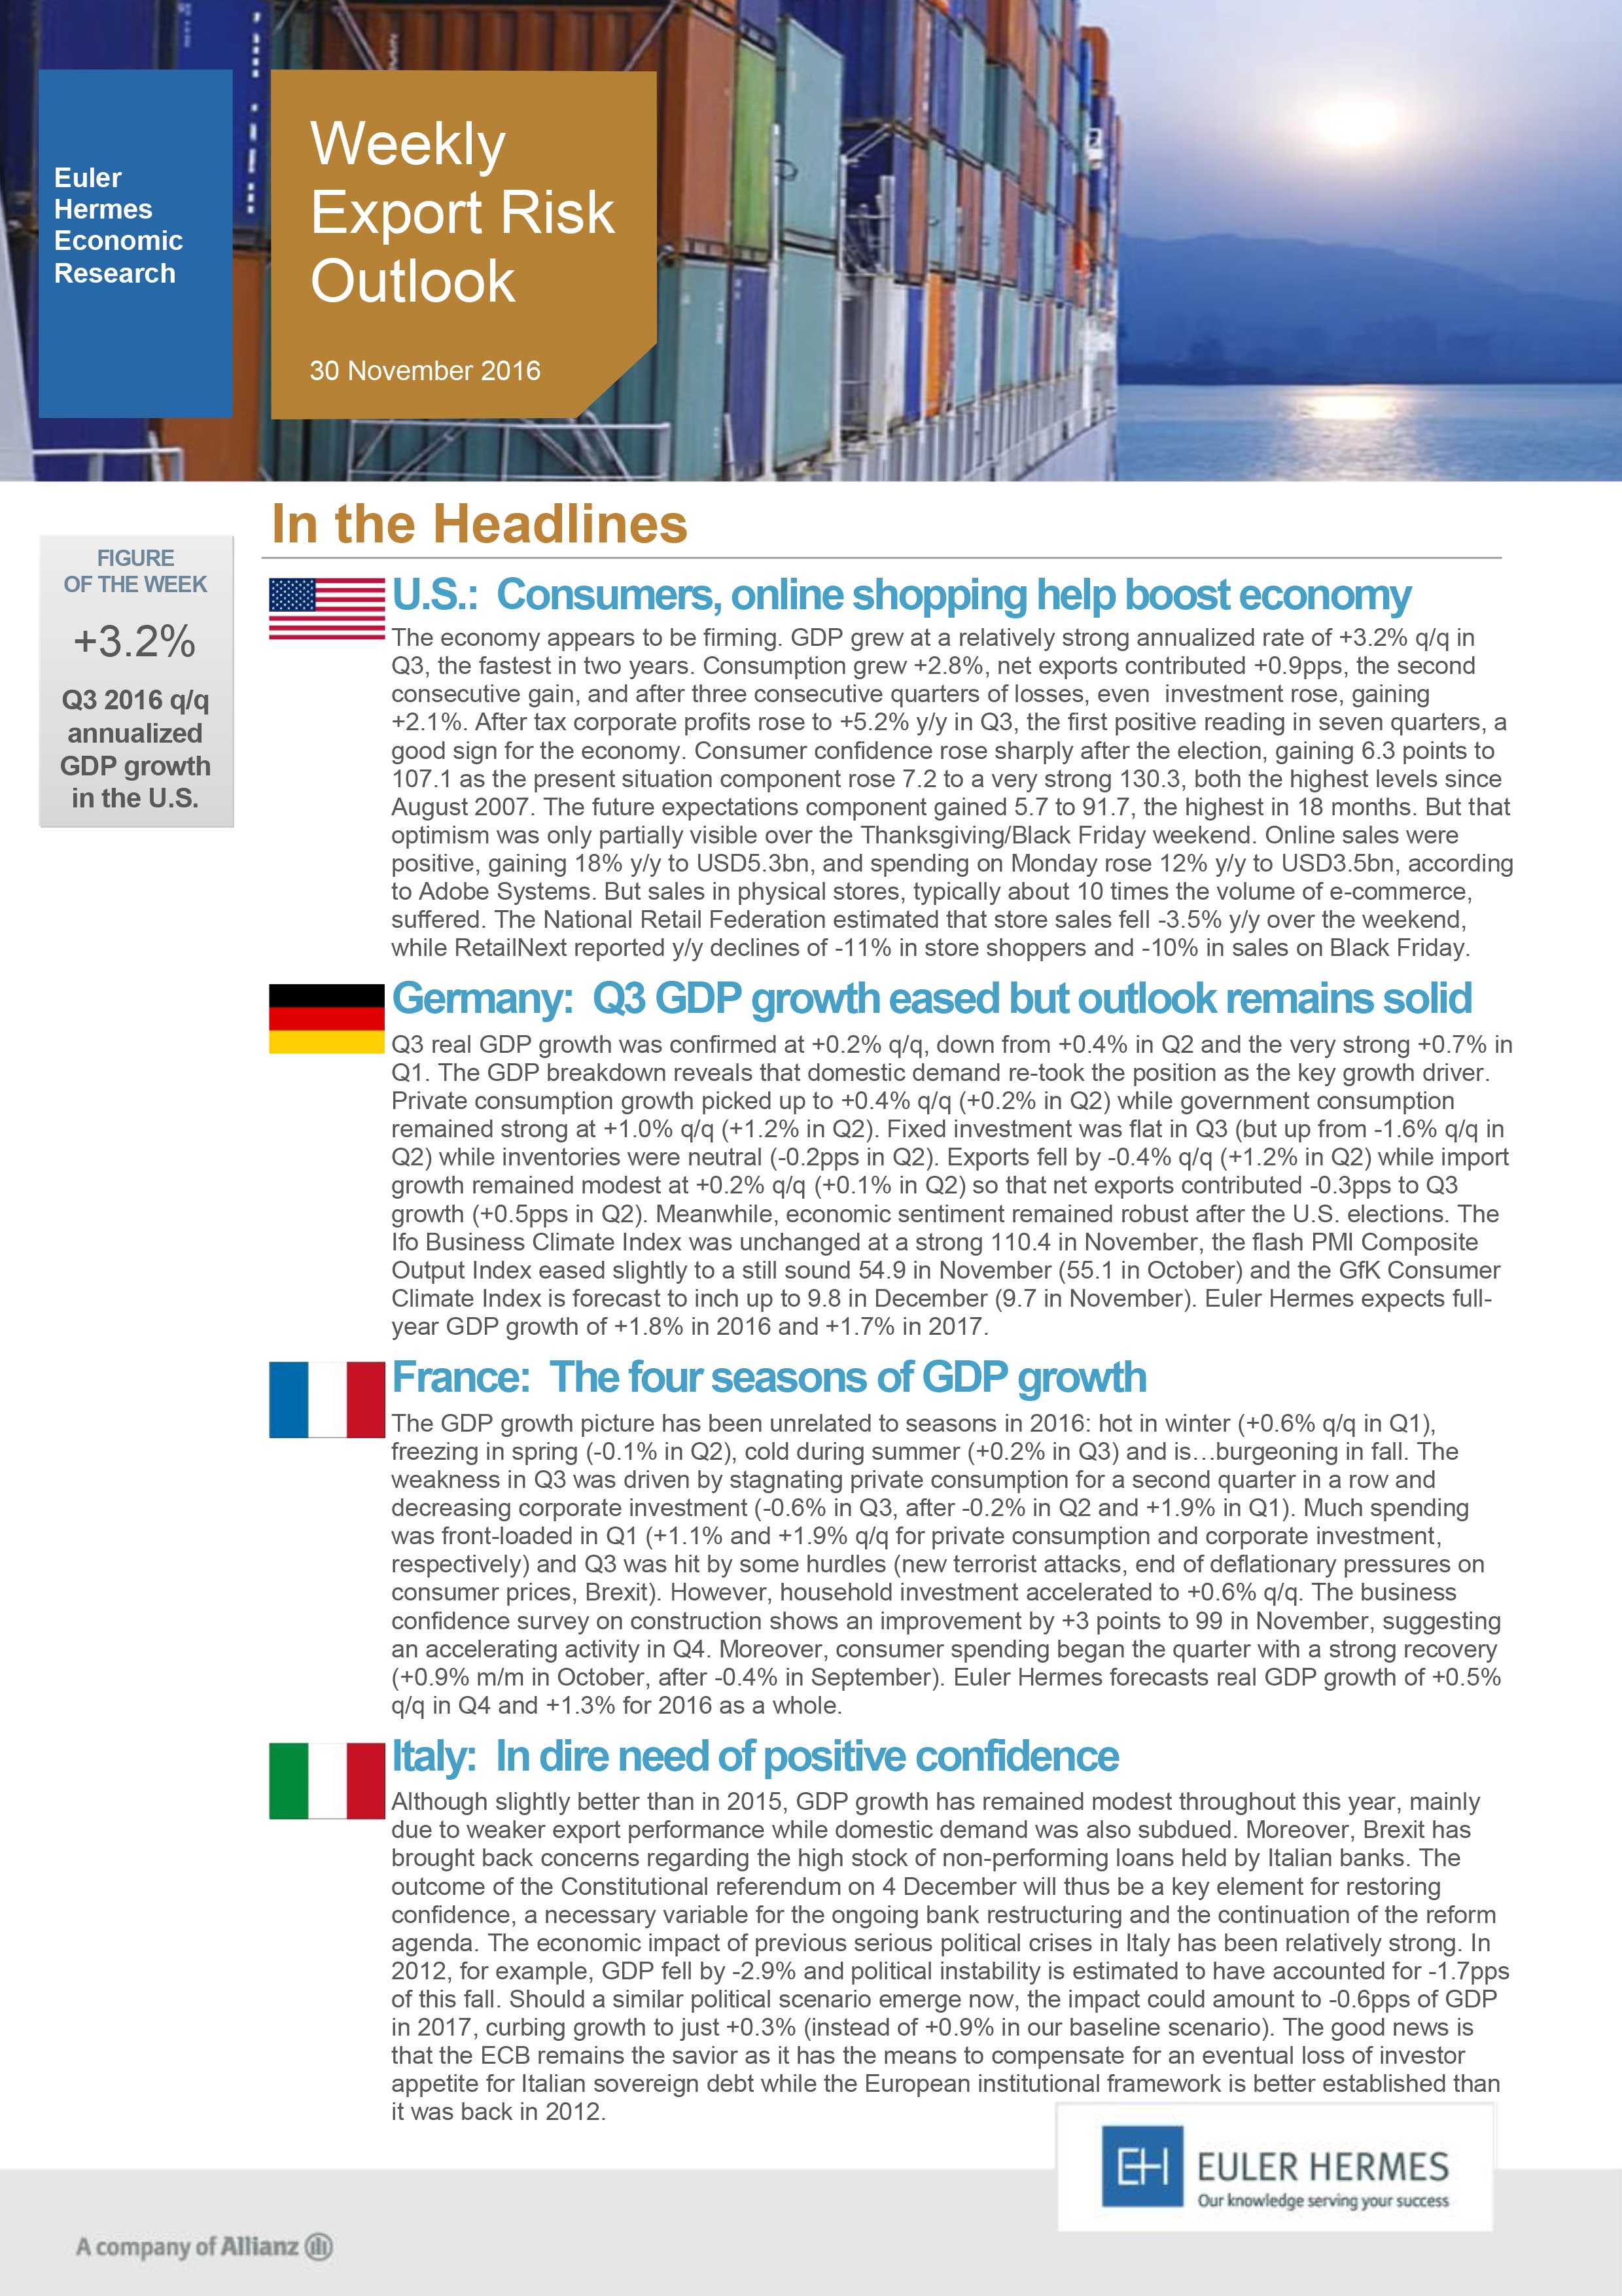 Weekly Export Risk Outlook